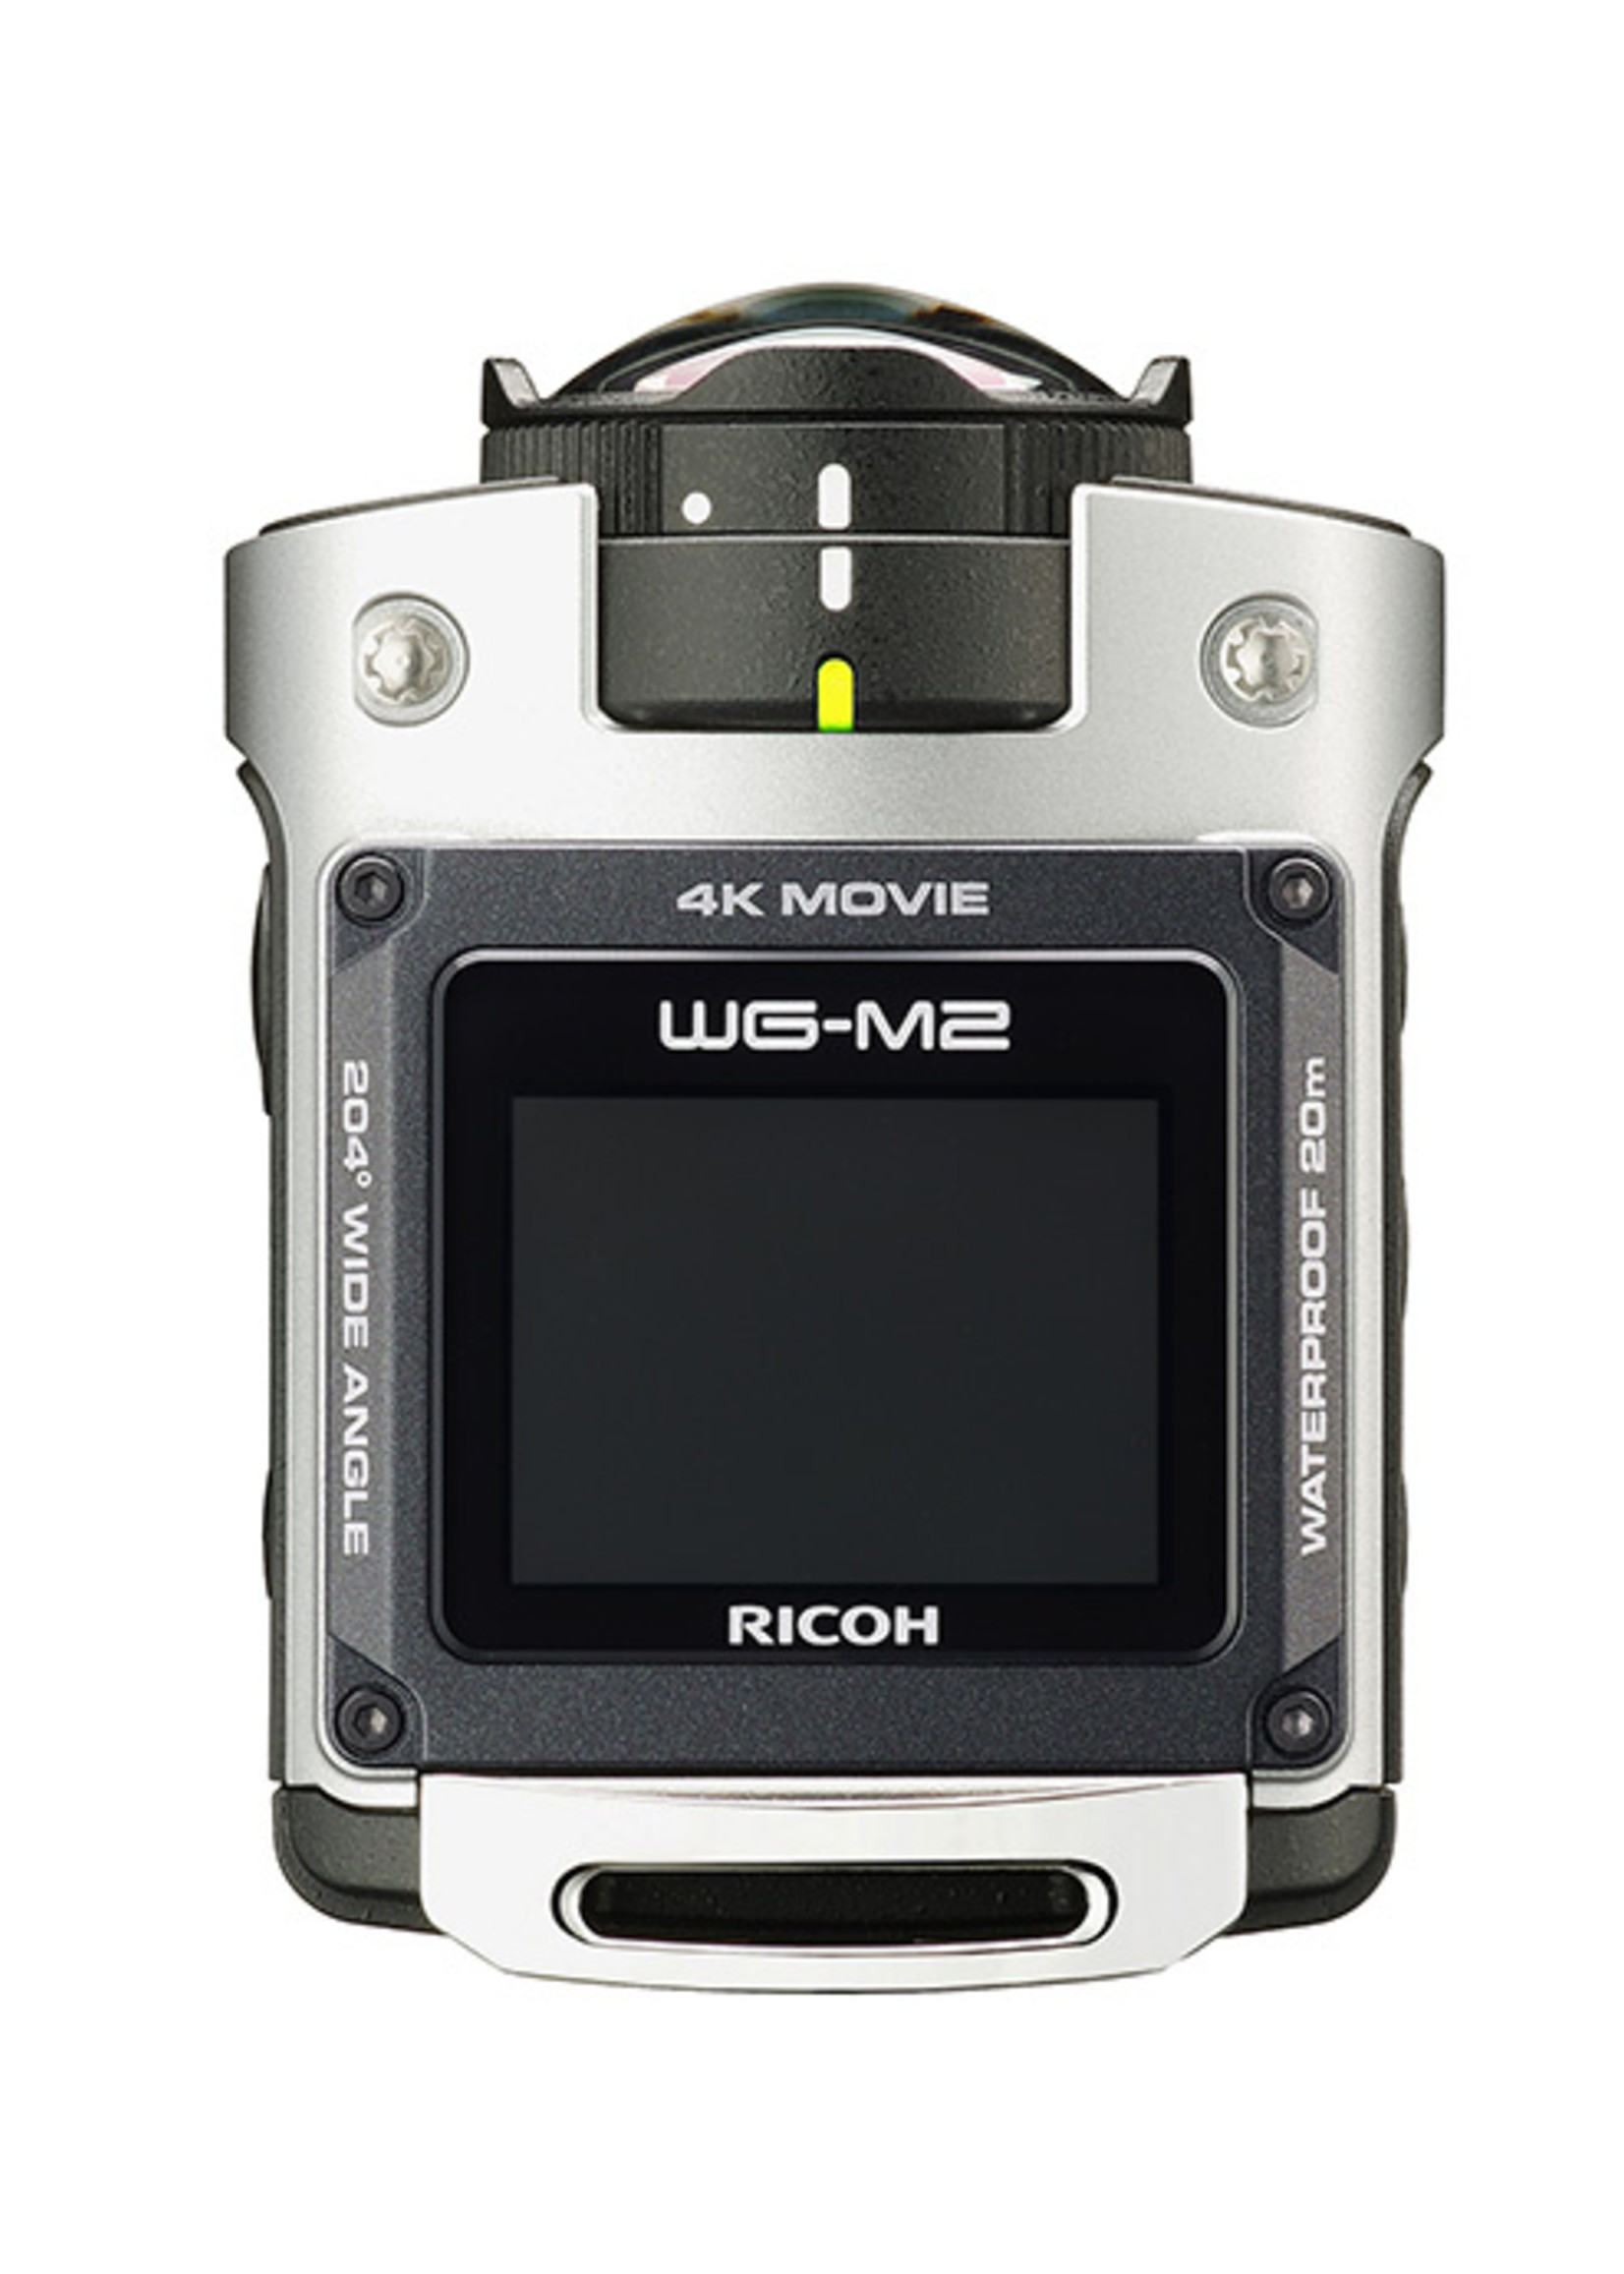 Ricoh/Pentax Pentax WG-M2 Silver